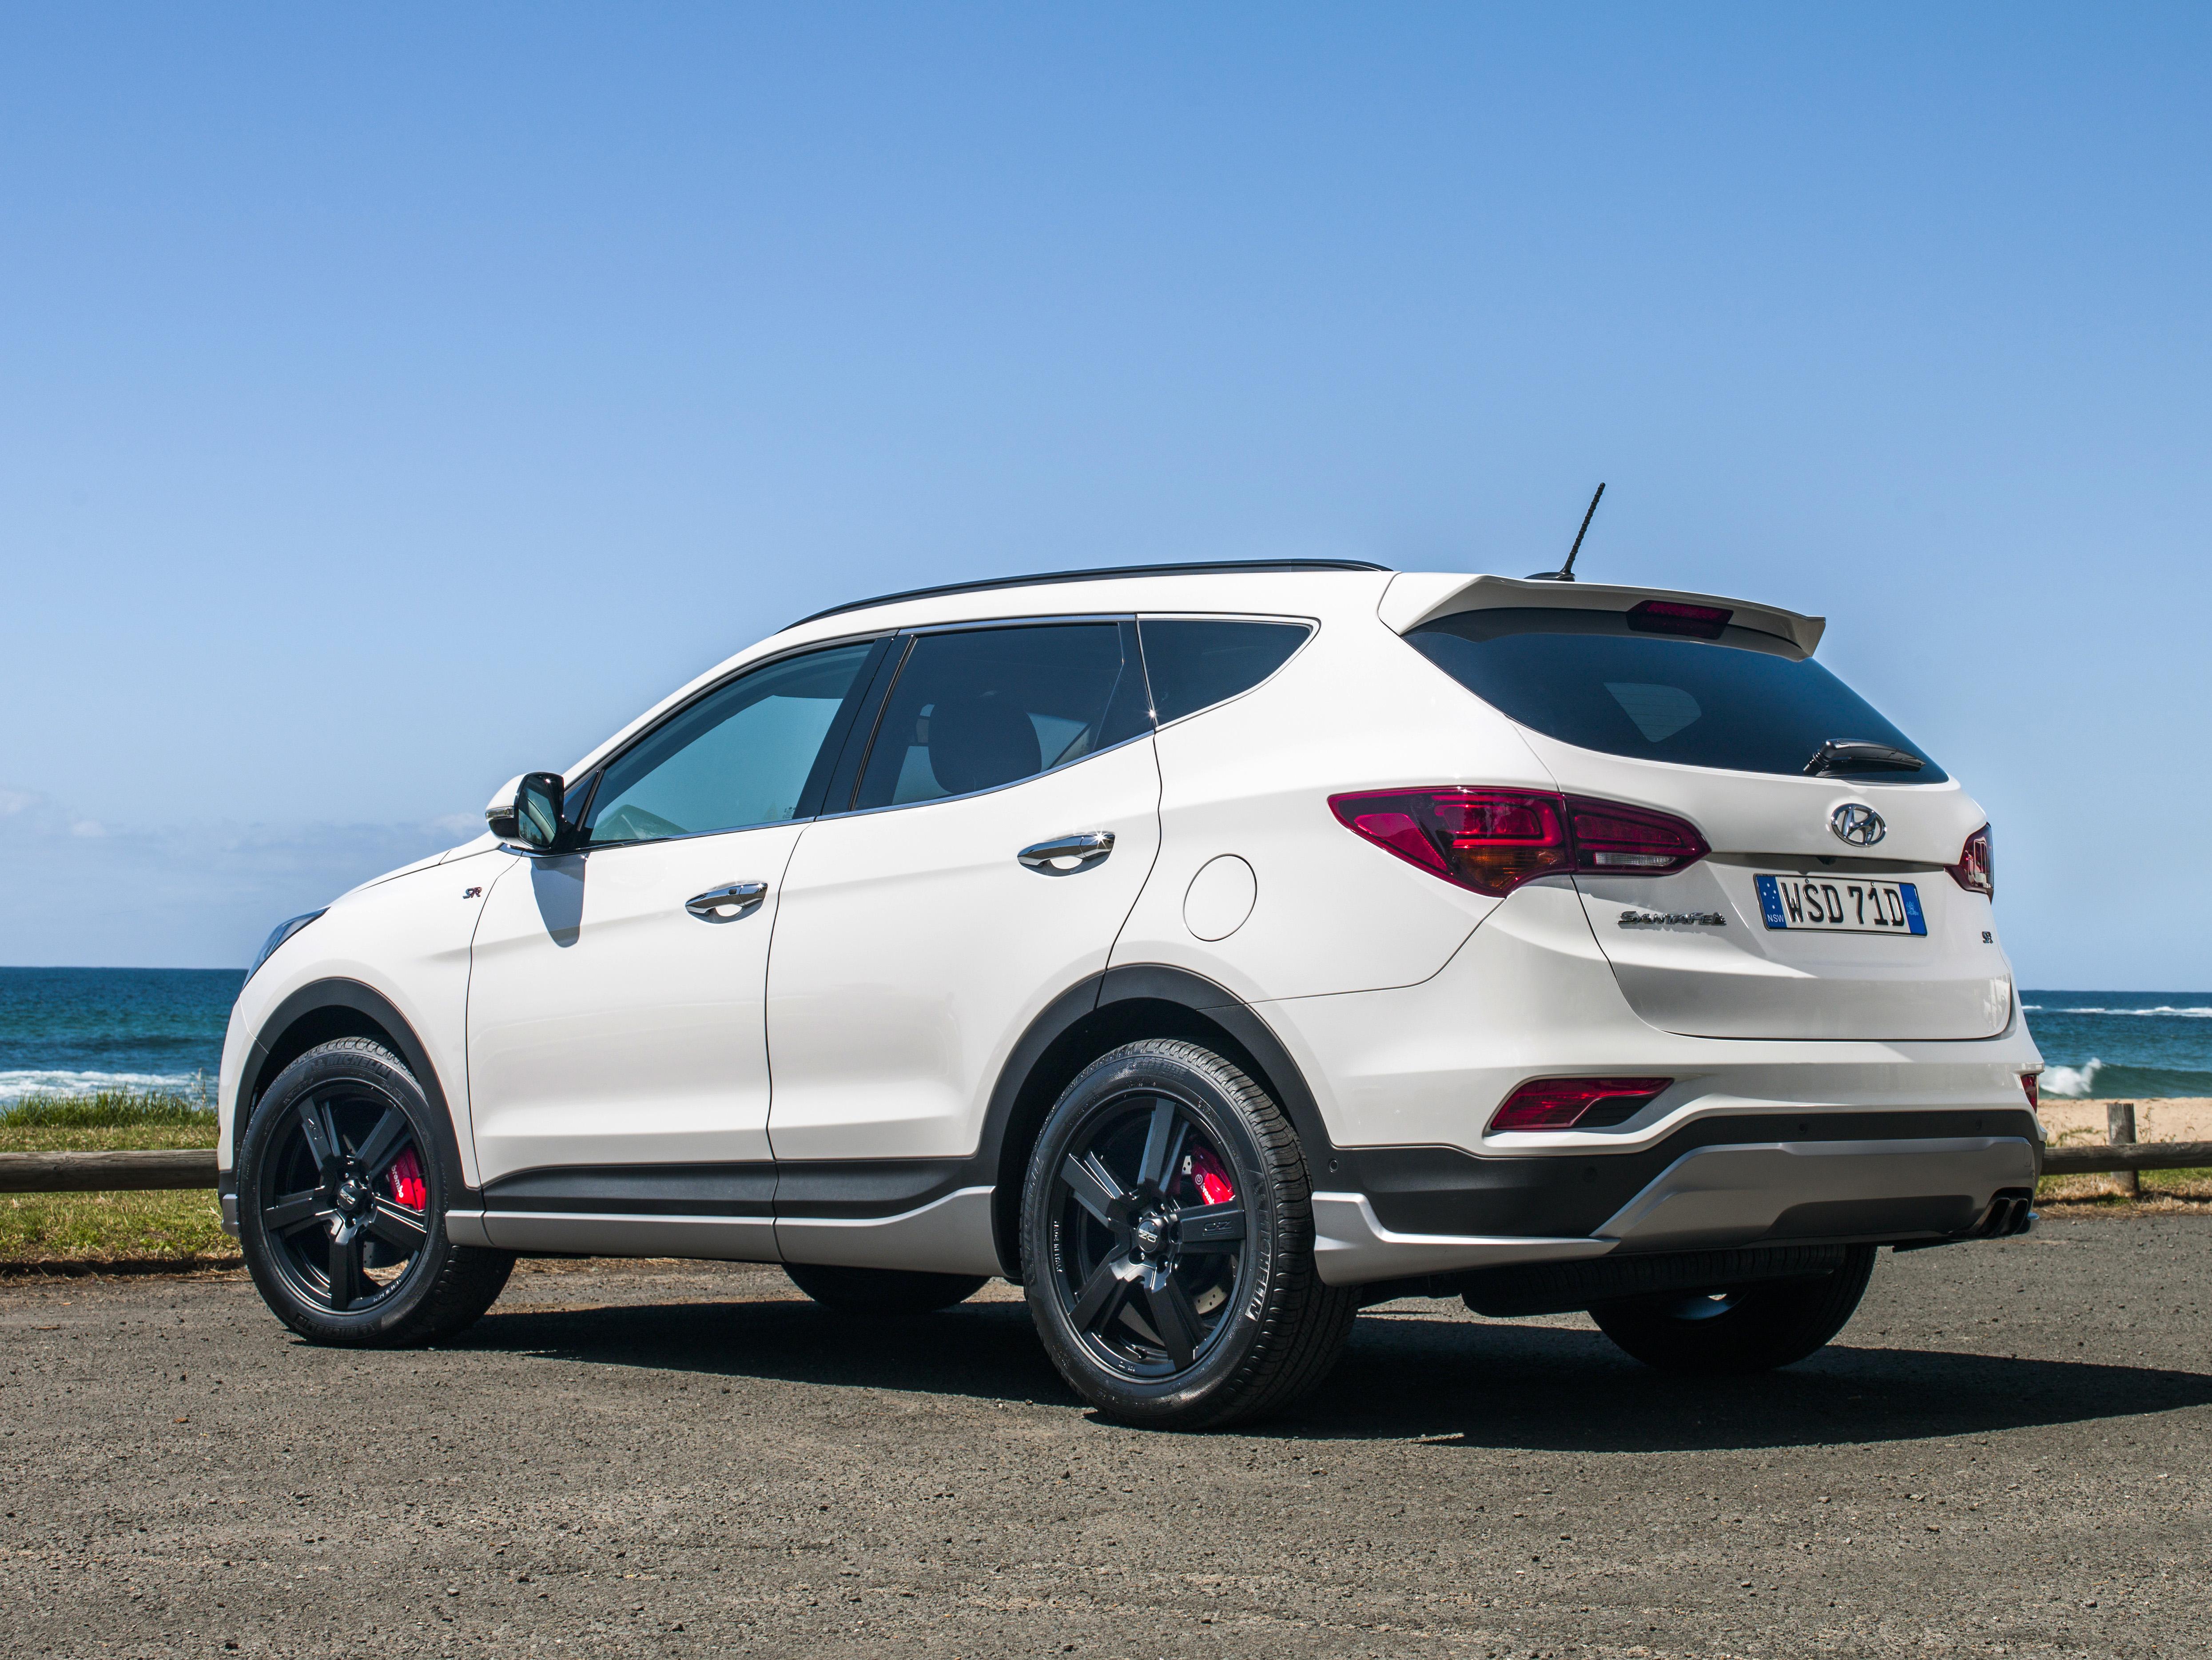 Santa Fe Suv >> 2016 Hyundai Santa Fe Review - photos | CarAdvice